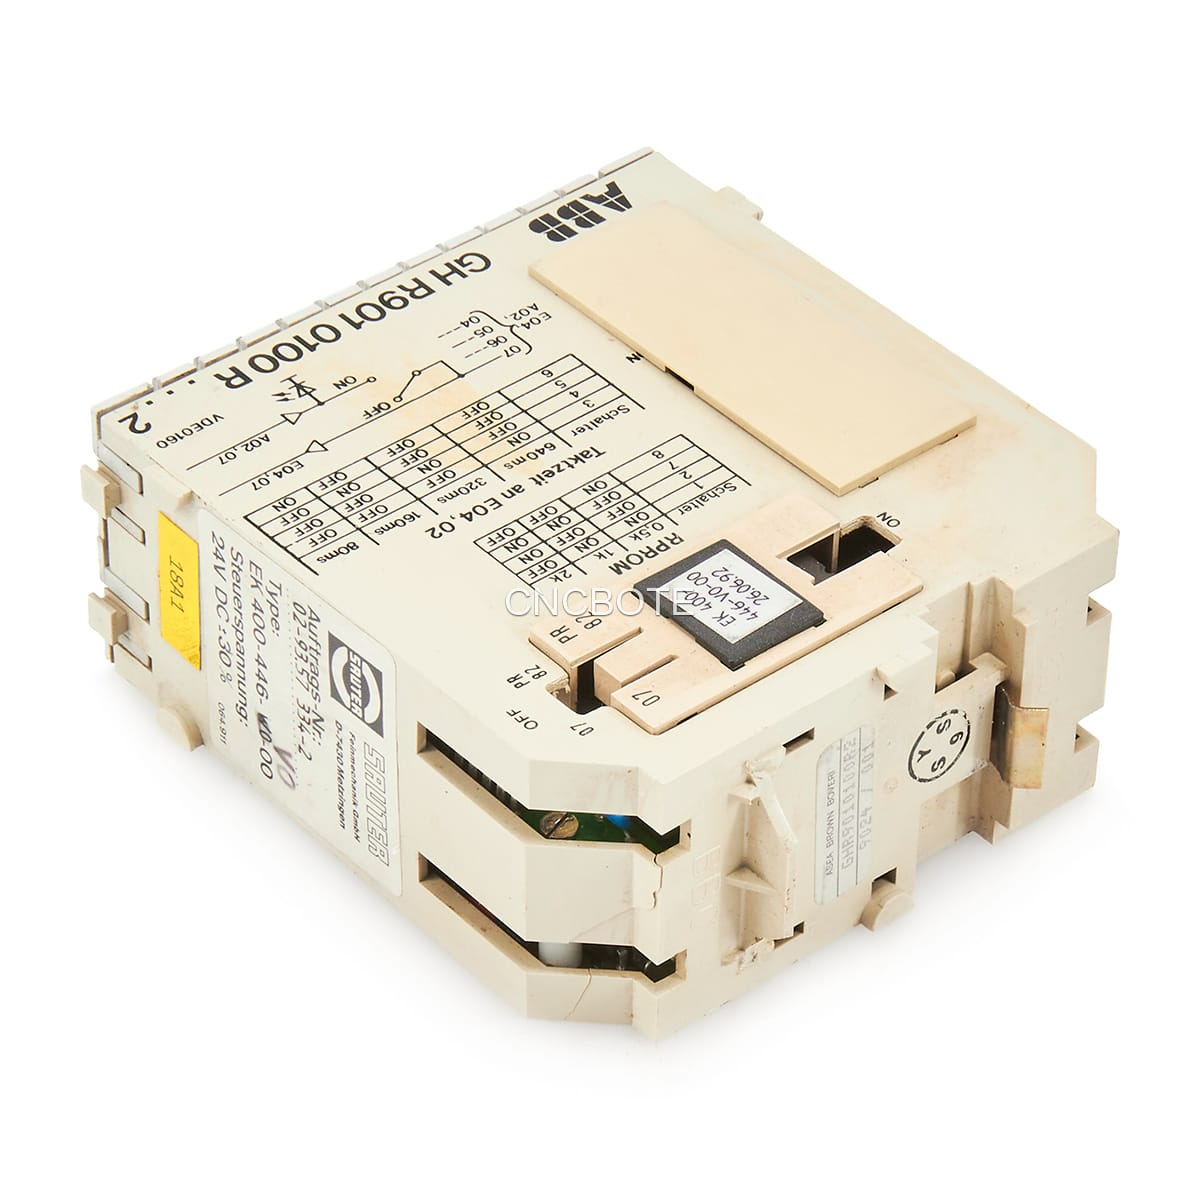 ABB GH R901 0100R2 Modul, Sauter EK 400-446-V0-00